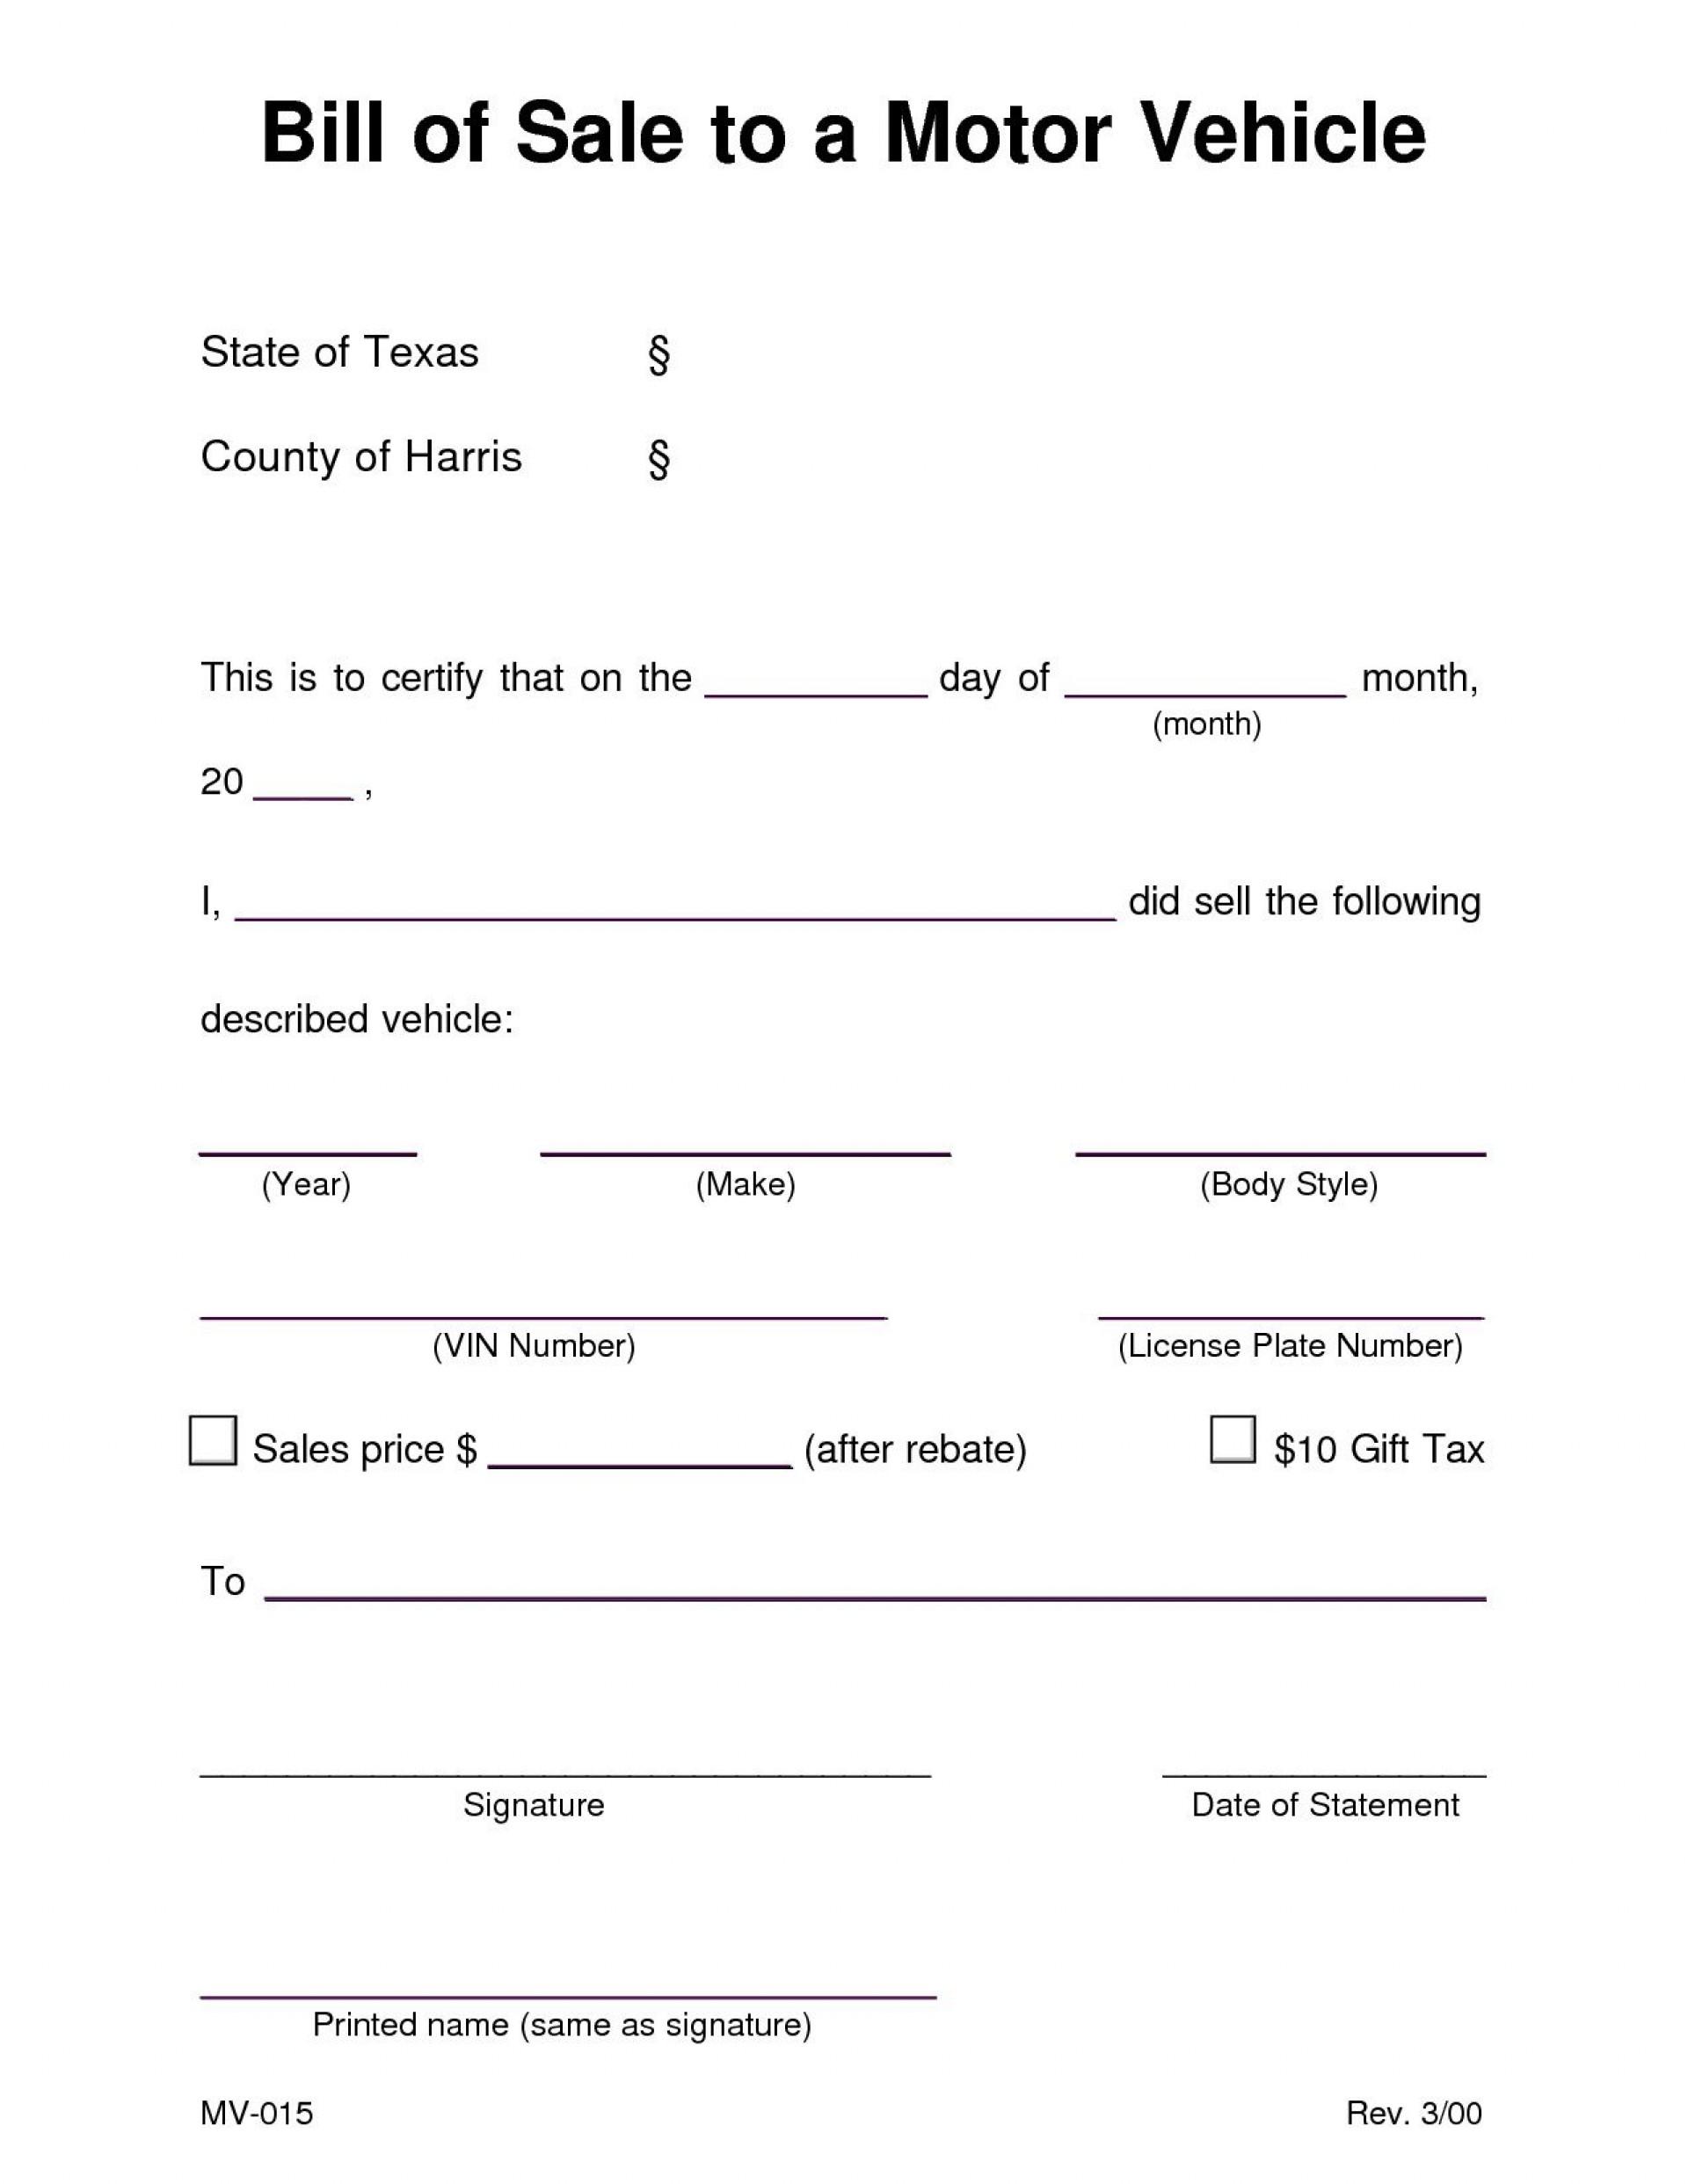 001 Shocking Bill Of Sale Template Texa Concept  Texas Free Car Form Dmv Document1920